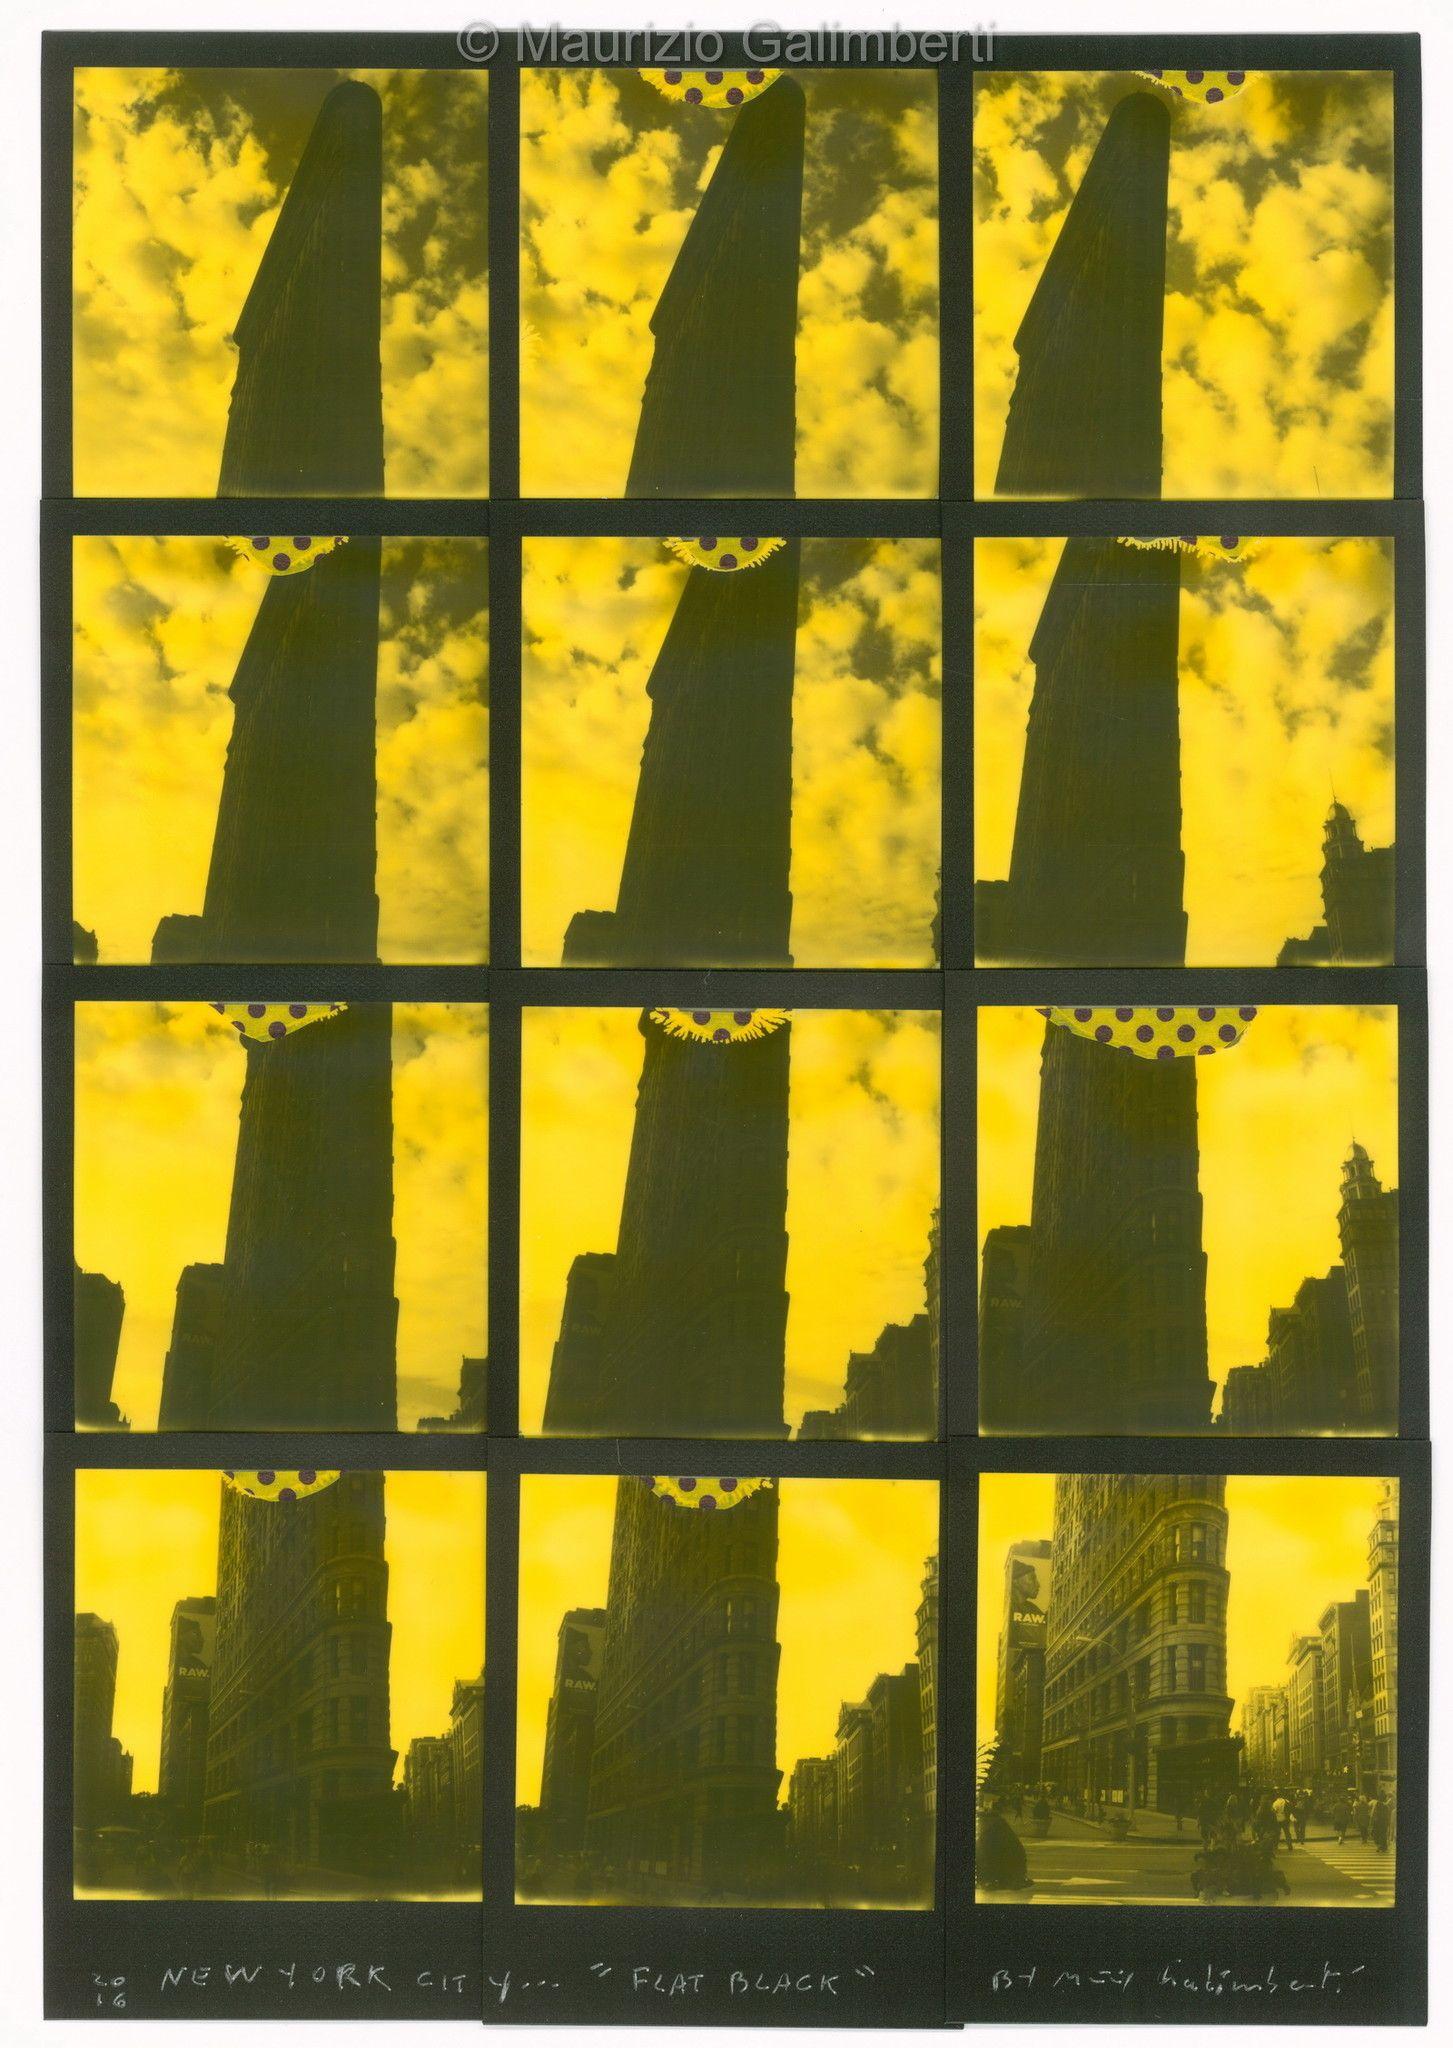 "VINTAGE POLAROID MAURIZIO GALIMBERTI ""NEW YORK CITY FLAT BLACK"" dimensioni cm. 49x60"